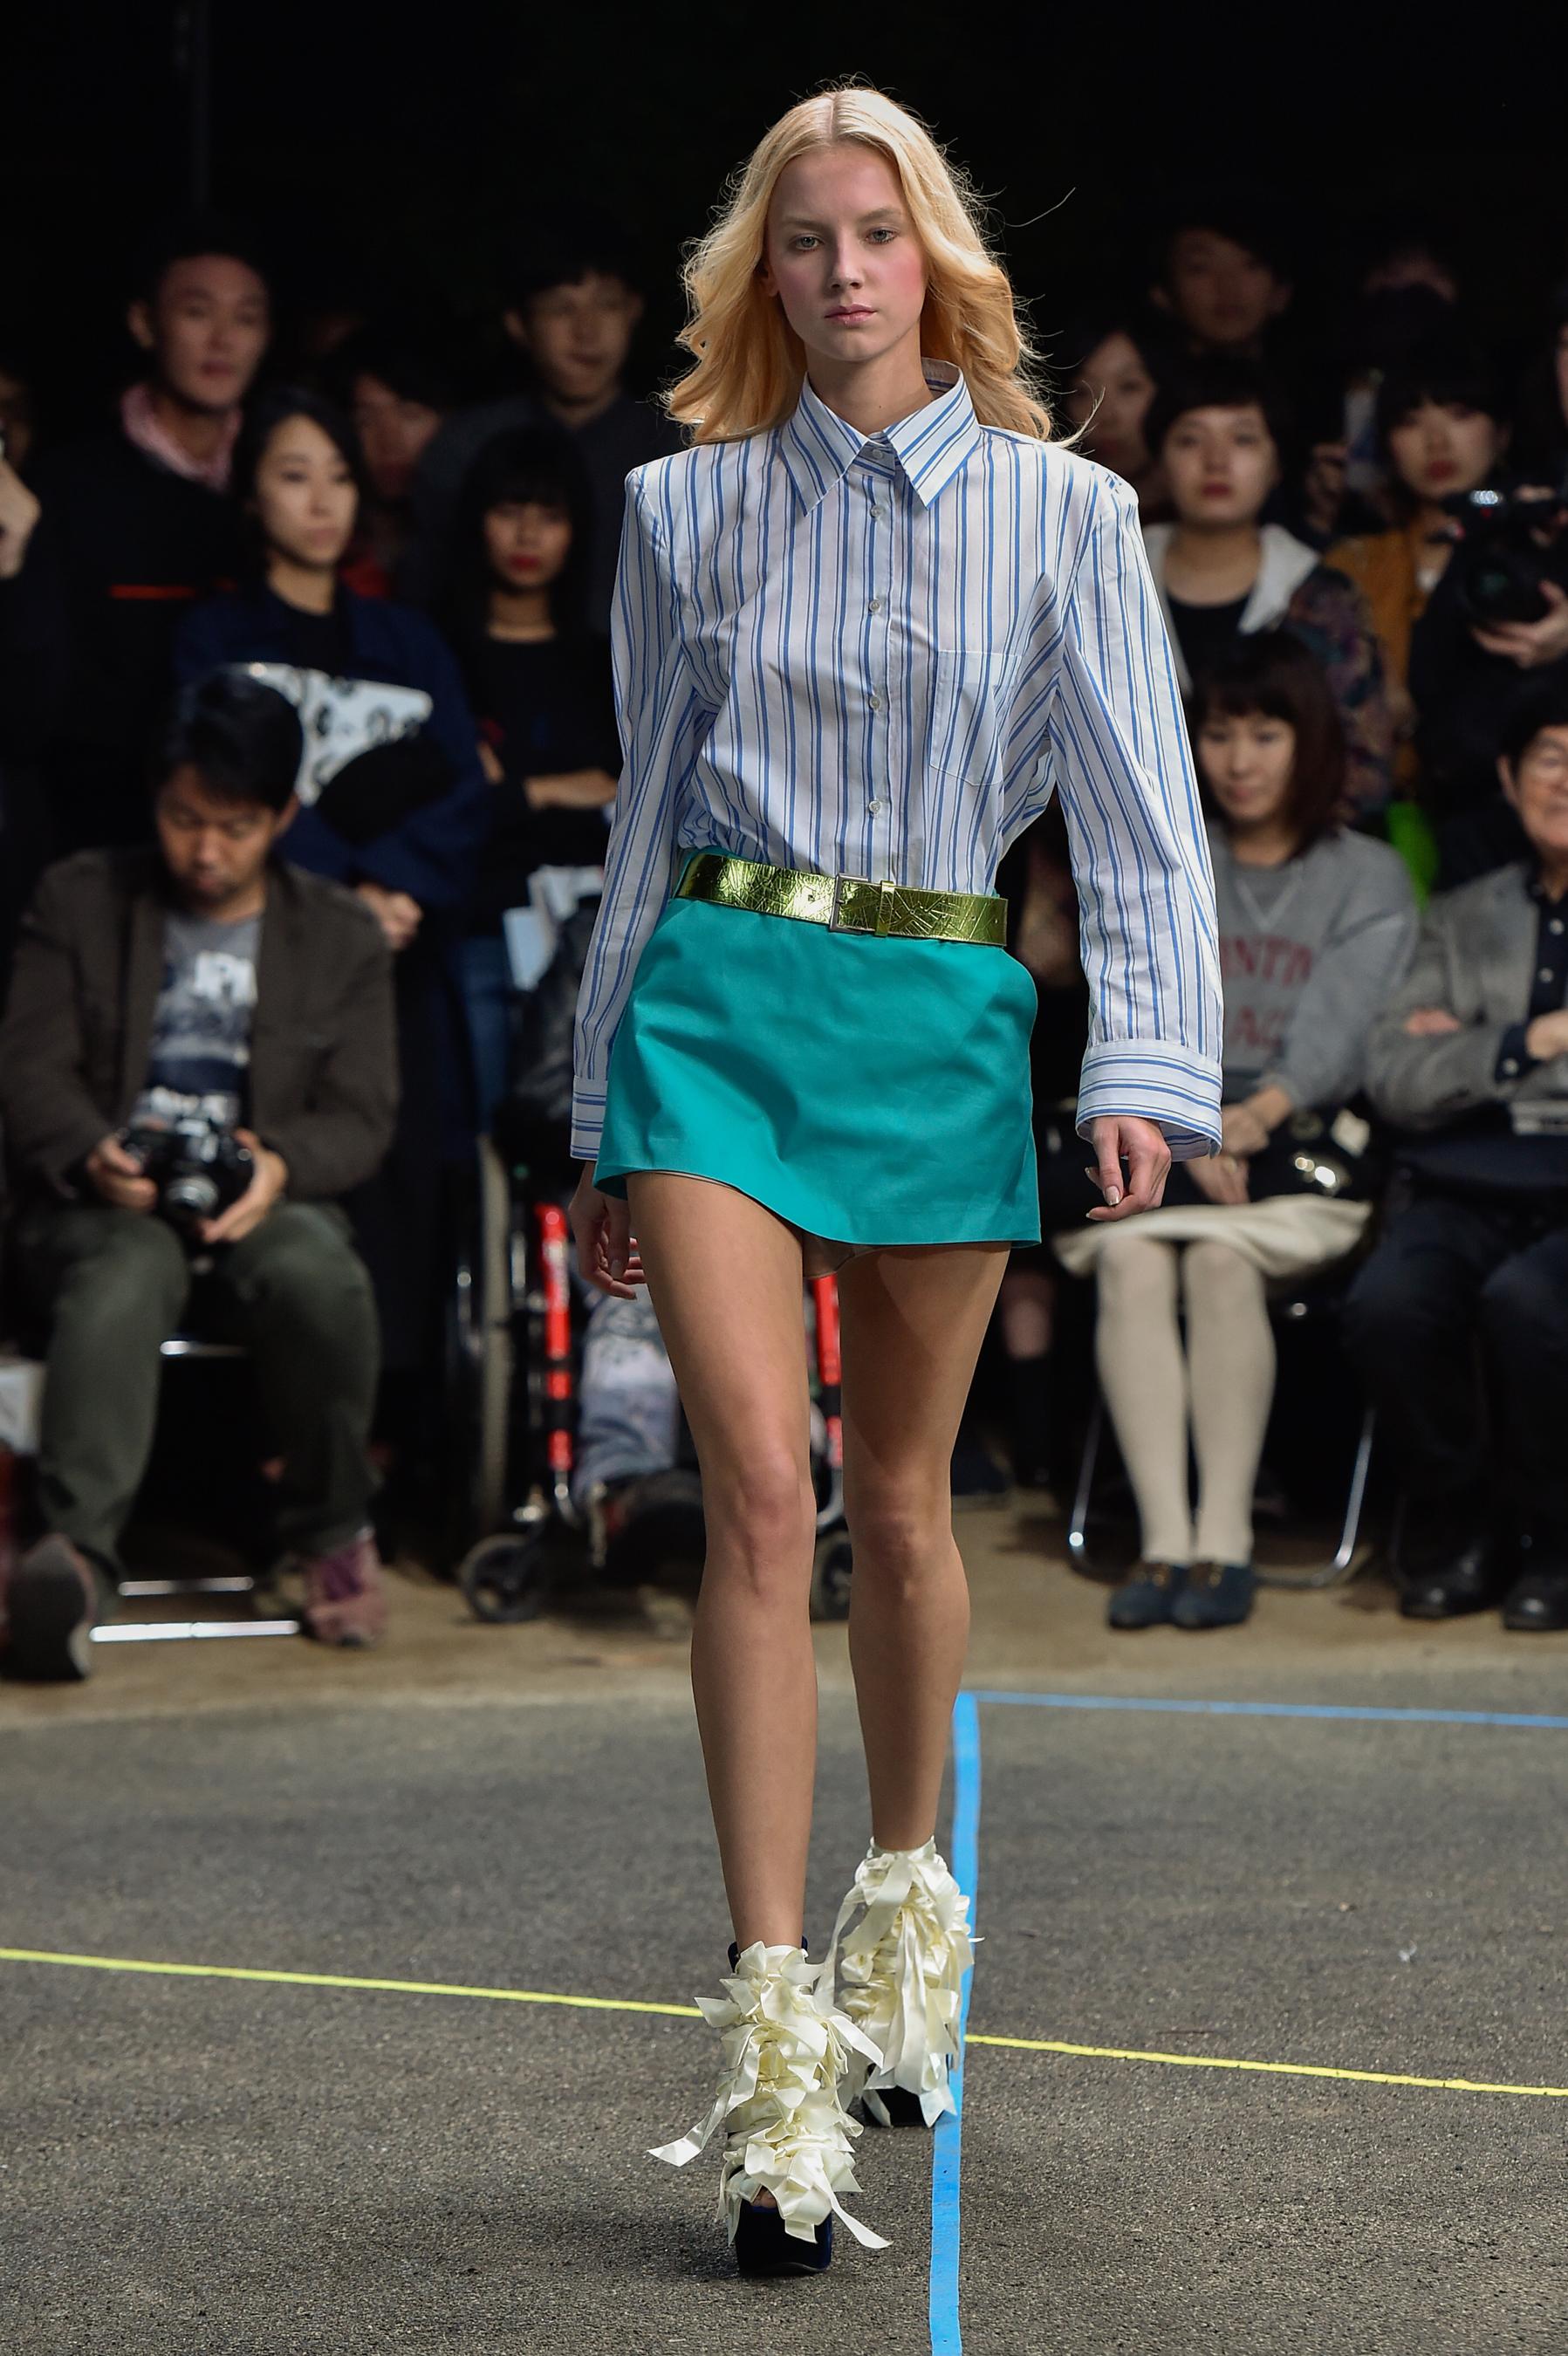 Mikio Sakabe RS17 075